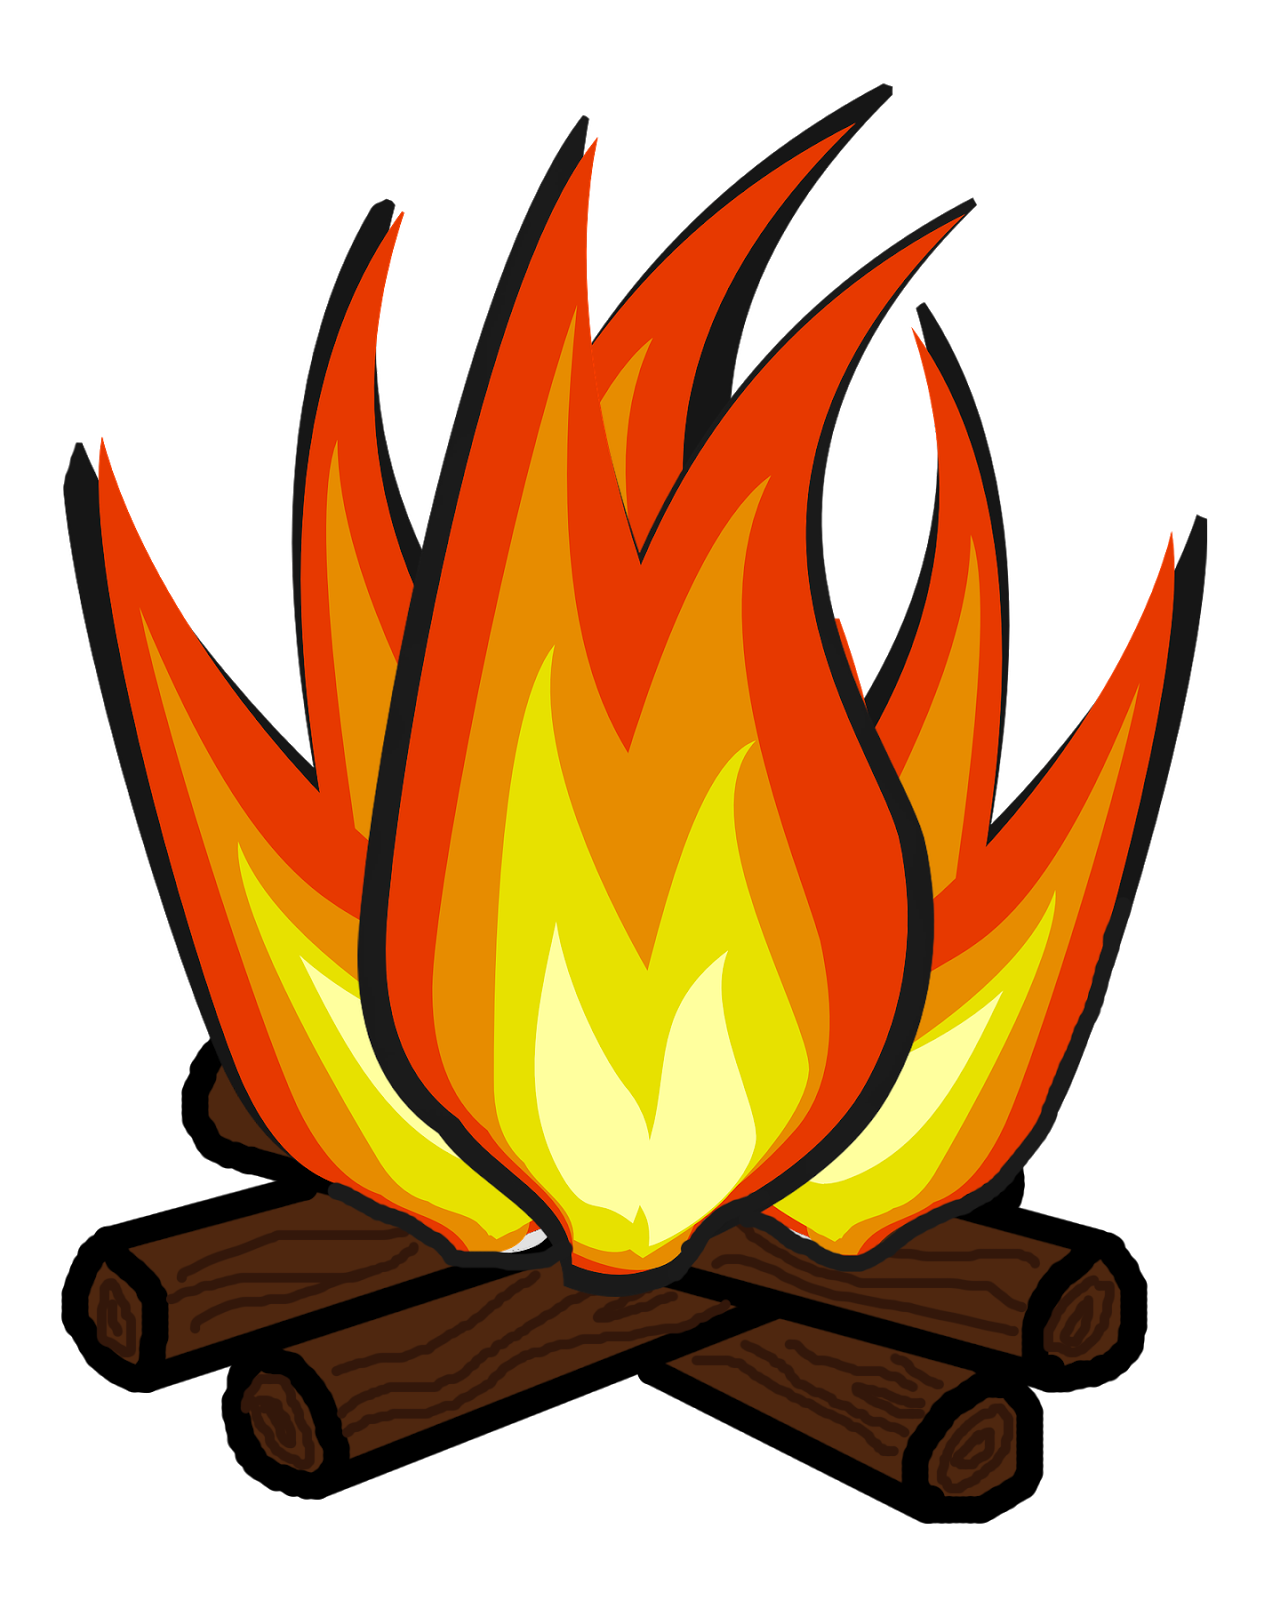 June campfire clipart.